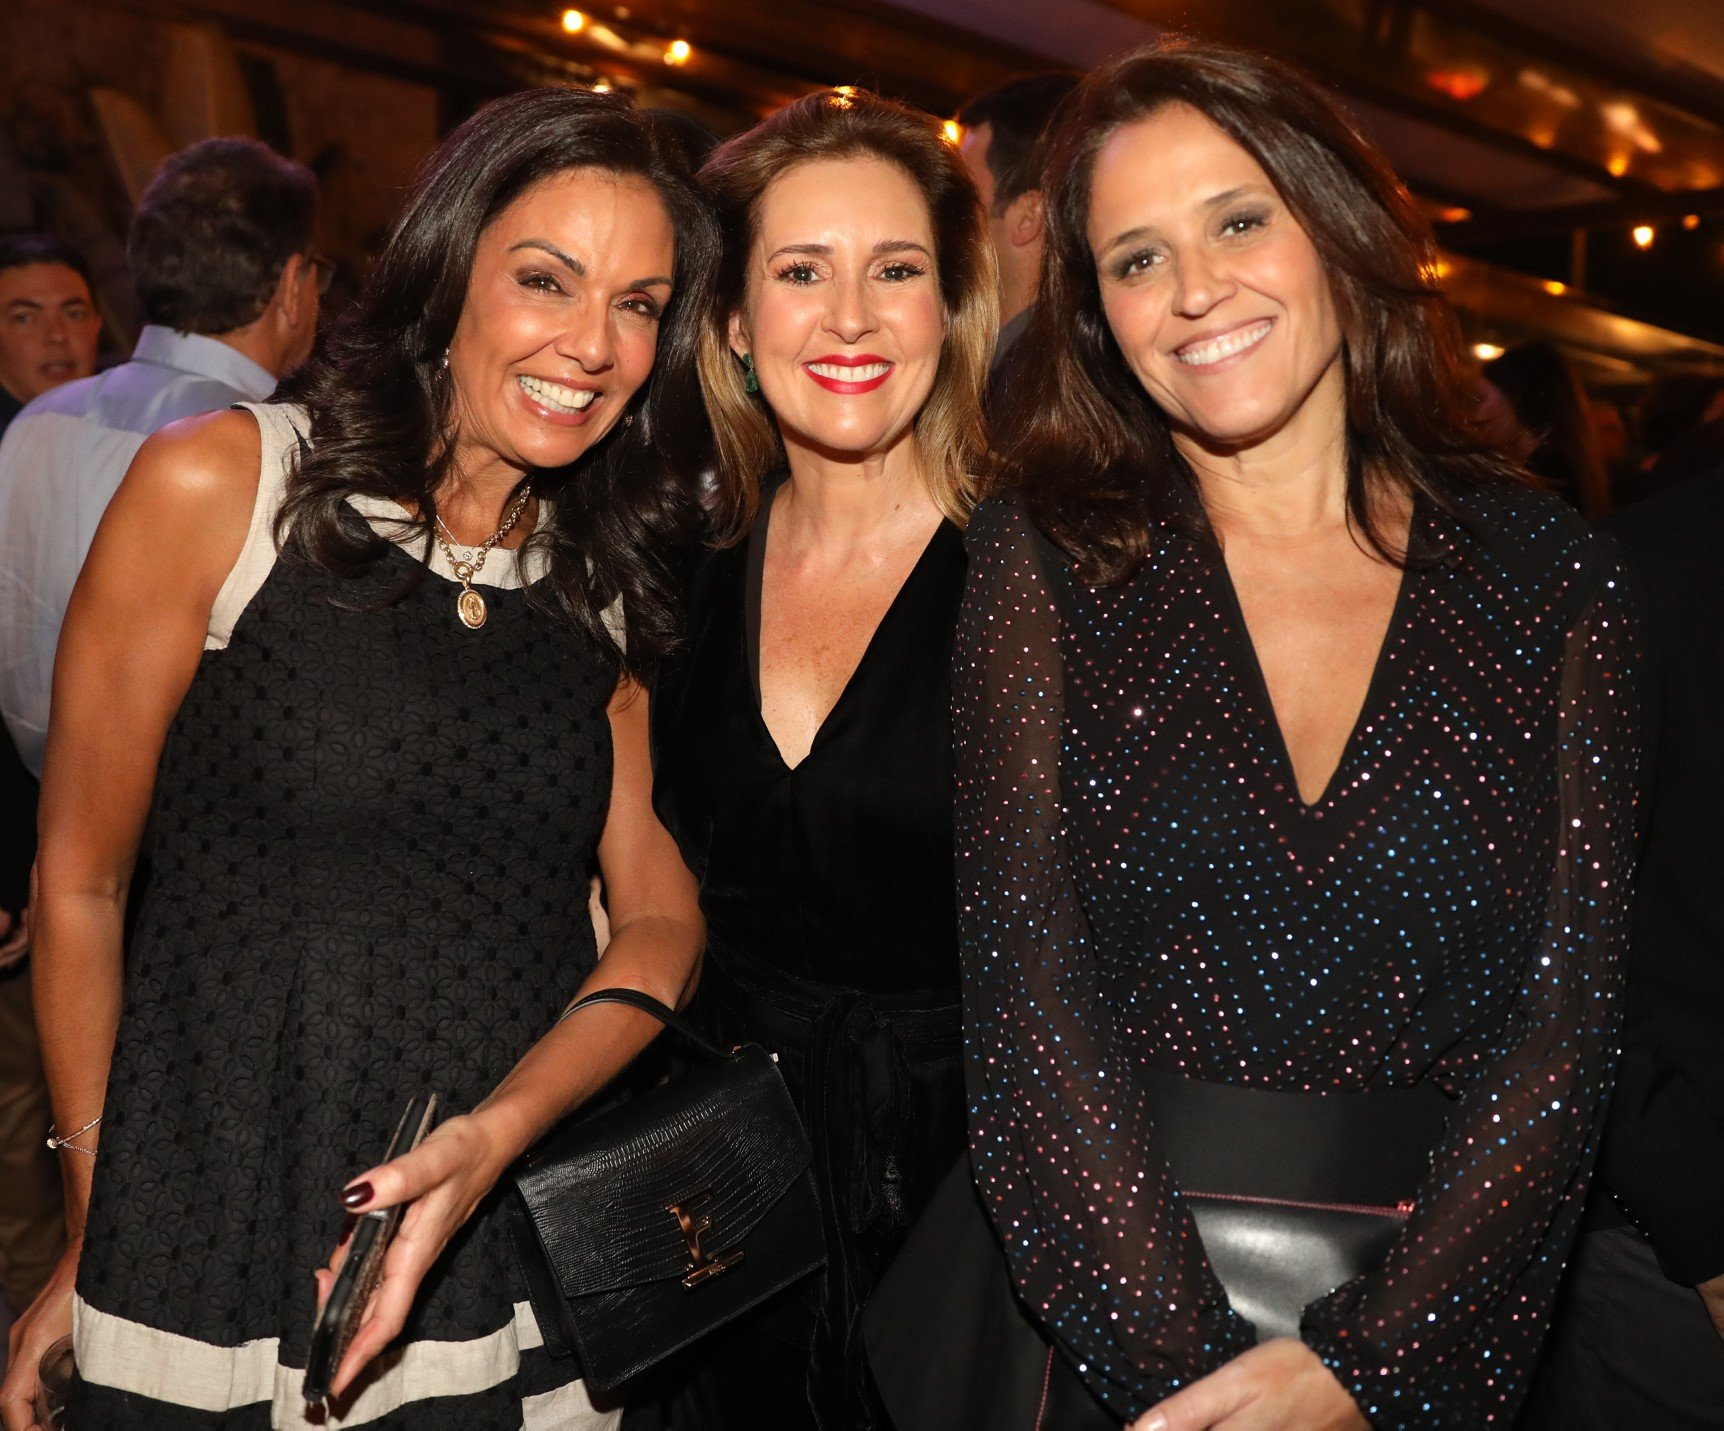 Cristina Ranzolin, Renata Capucci e Ana Luiza Guimarães  /Foto: TV Globo /João Cotta e João Miguel Jr.